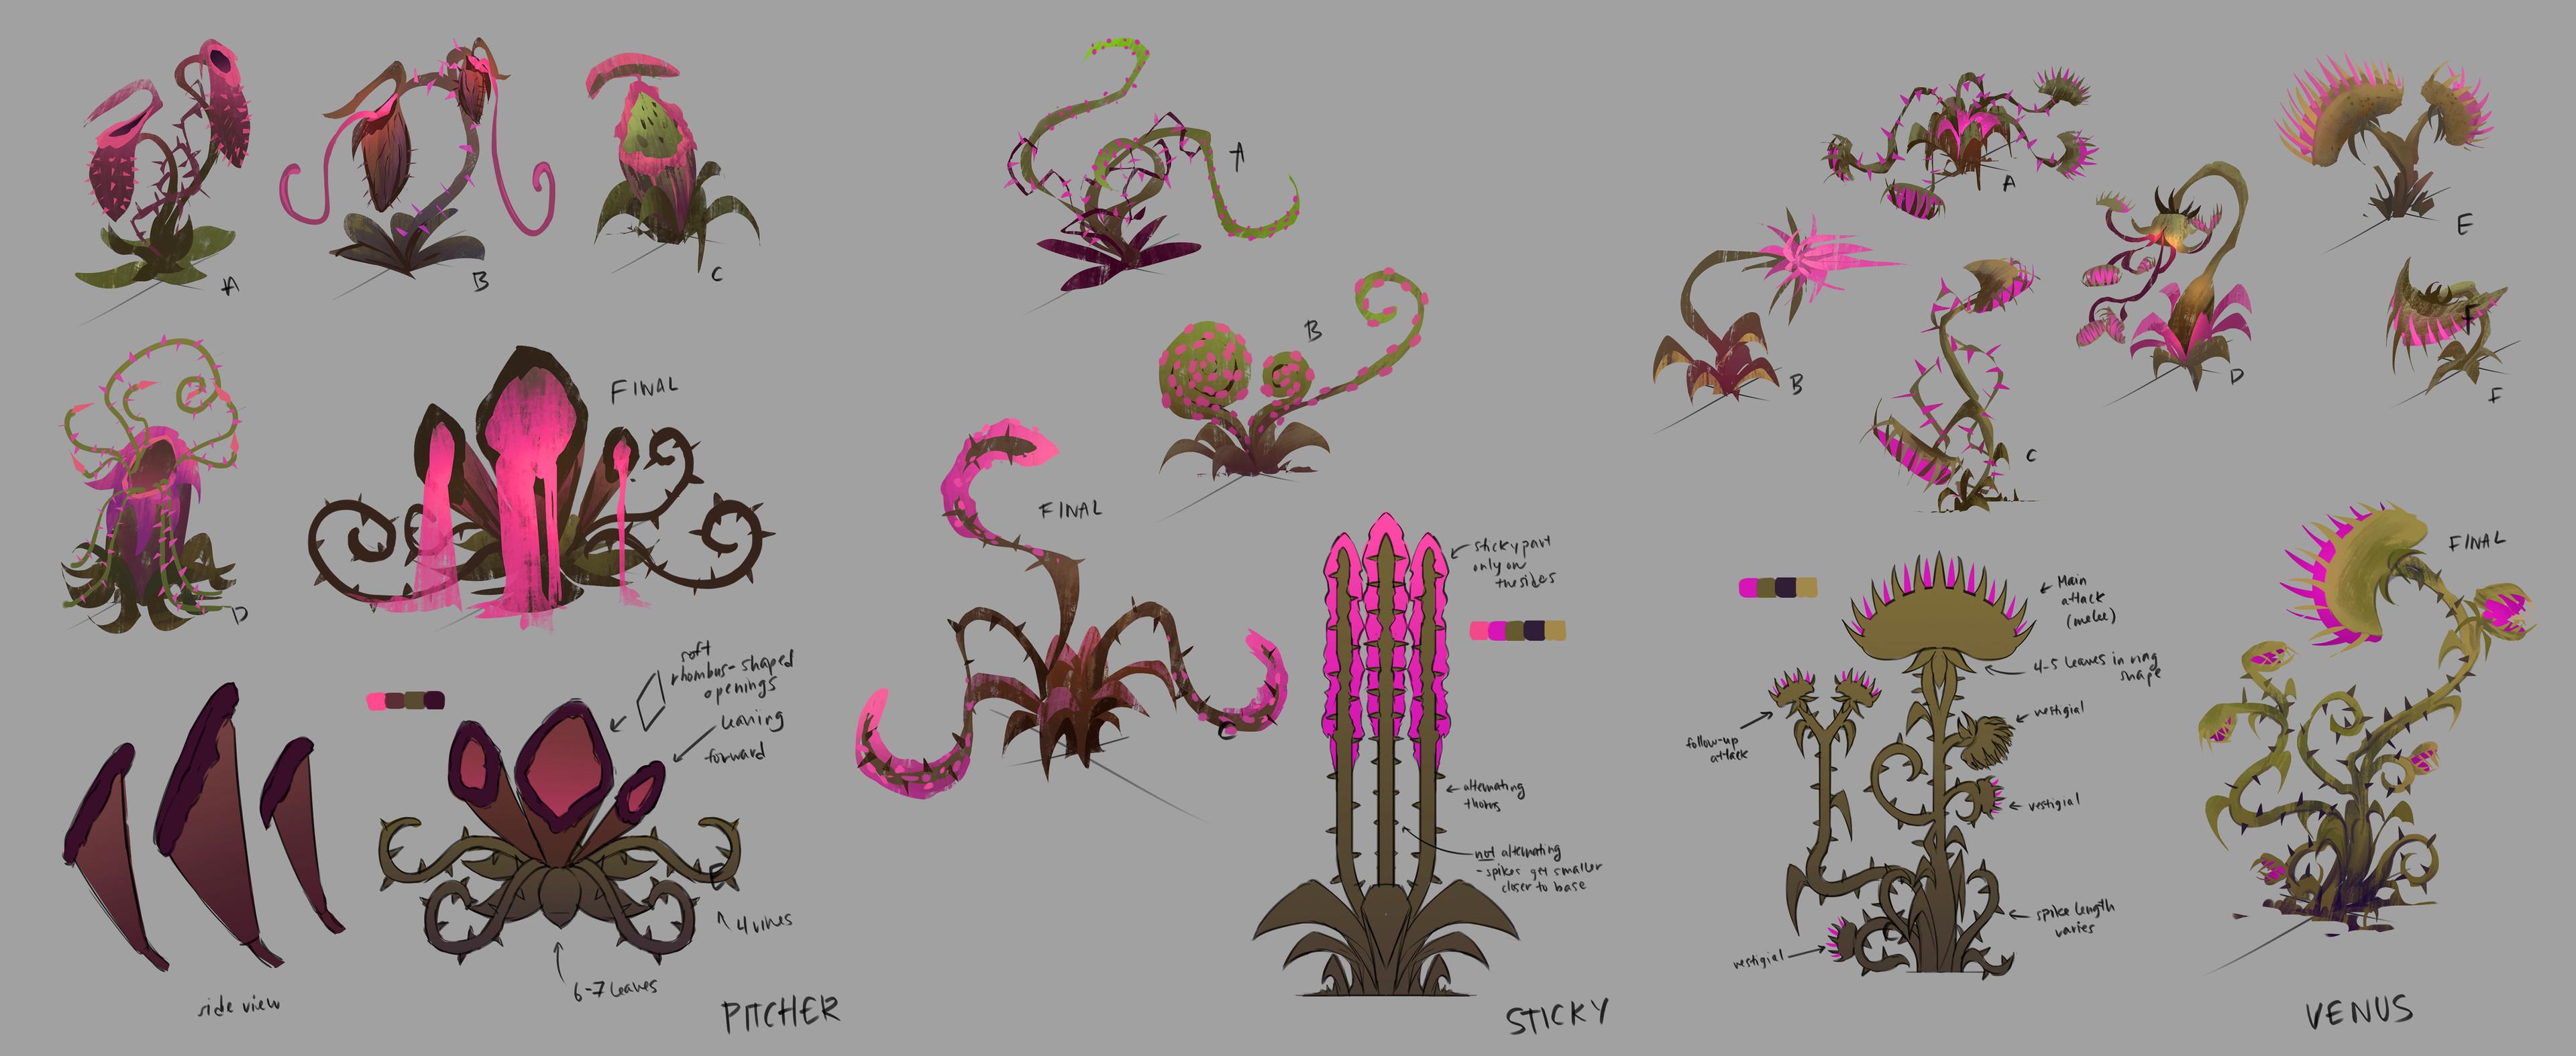 Plant explorations & callouts (3 main plant types)